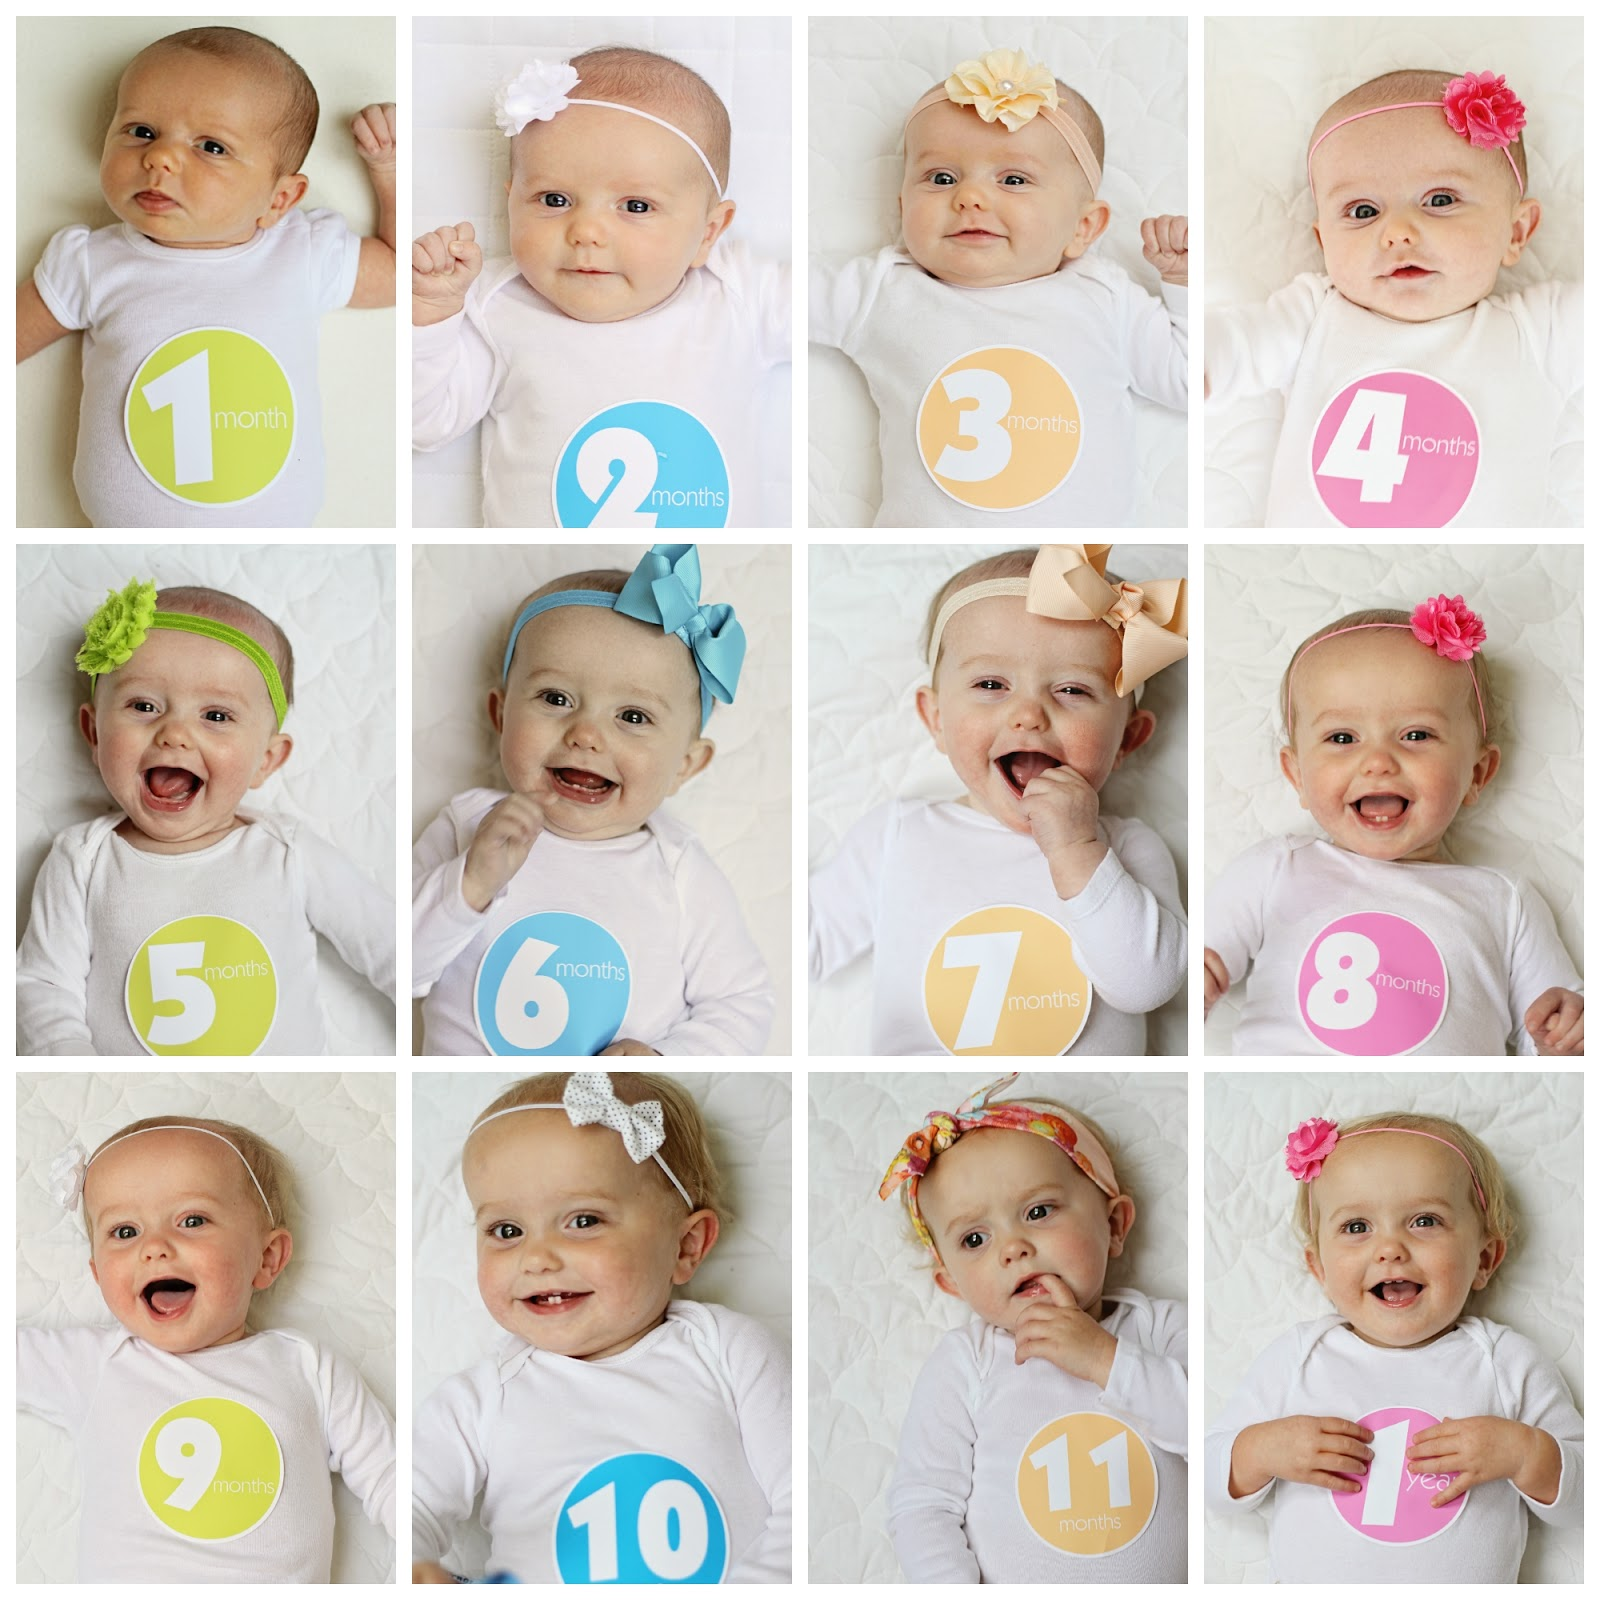 12 Month Photo Collage Kraft Brown 12 Month First Year Boy Girl